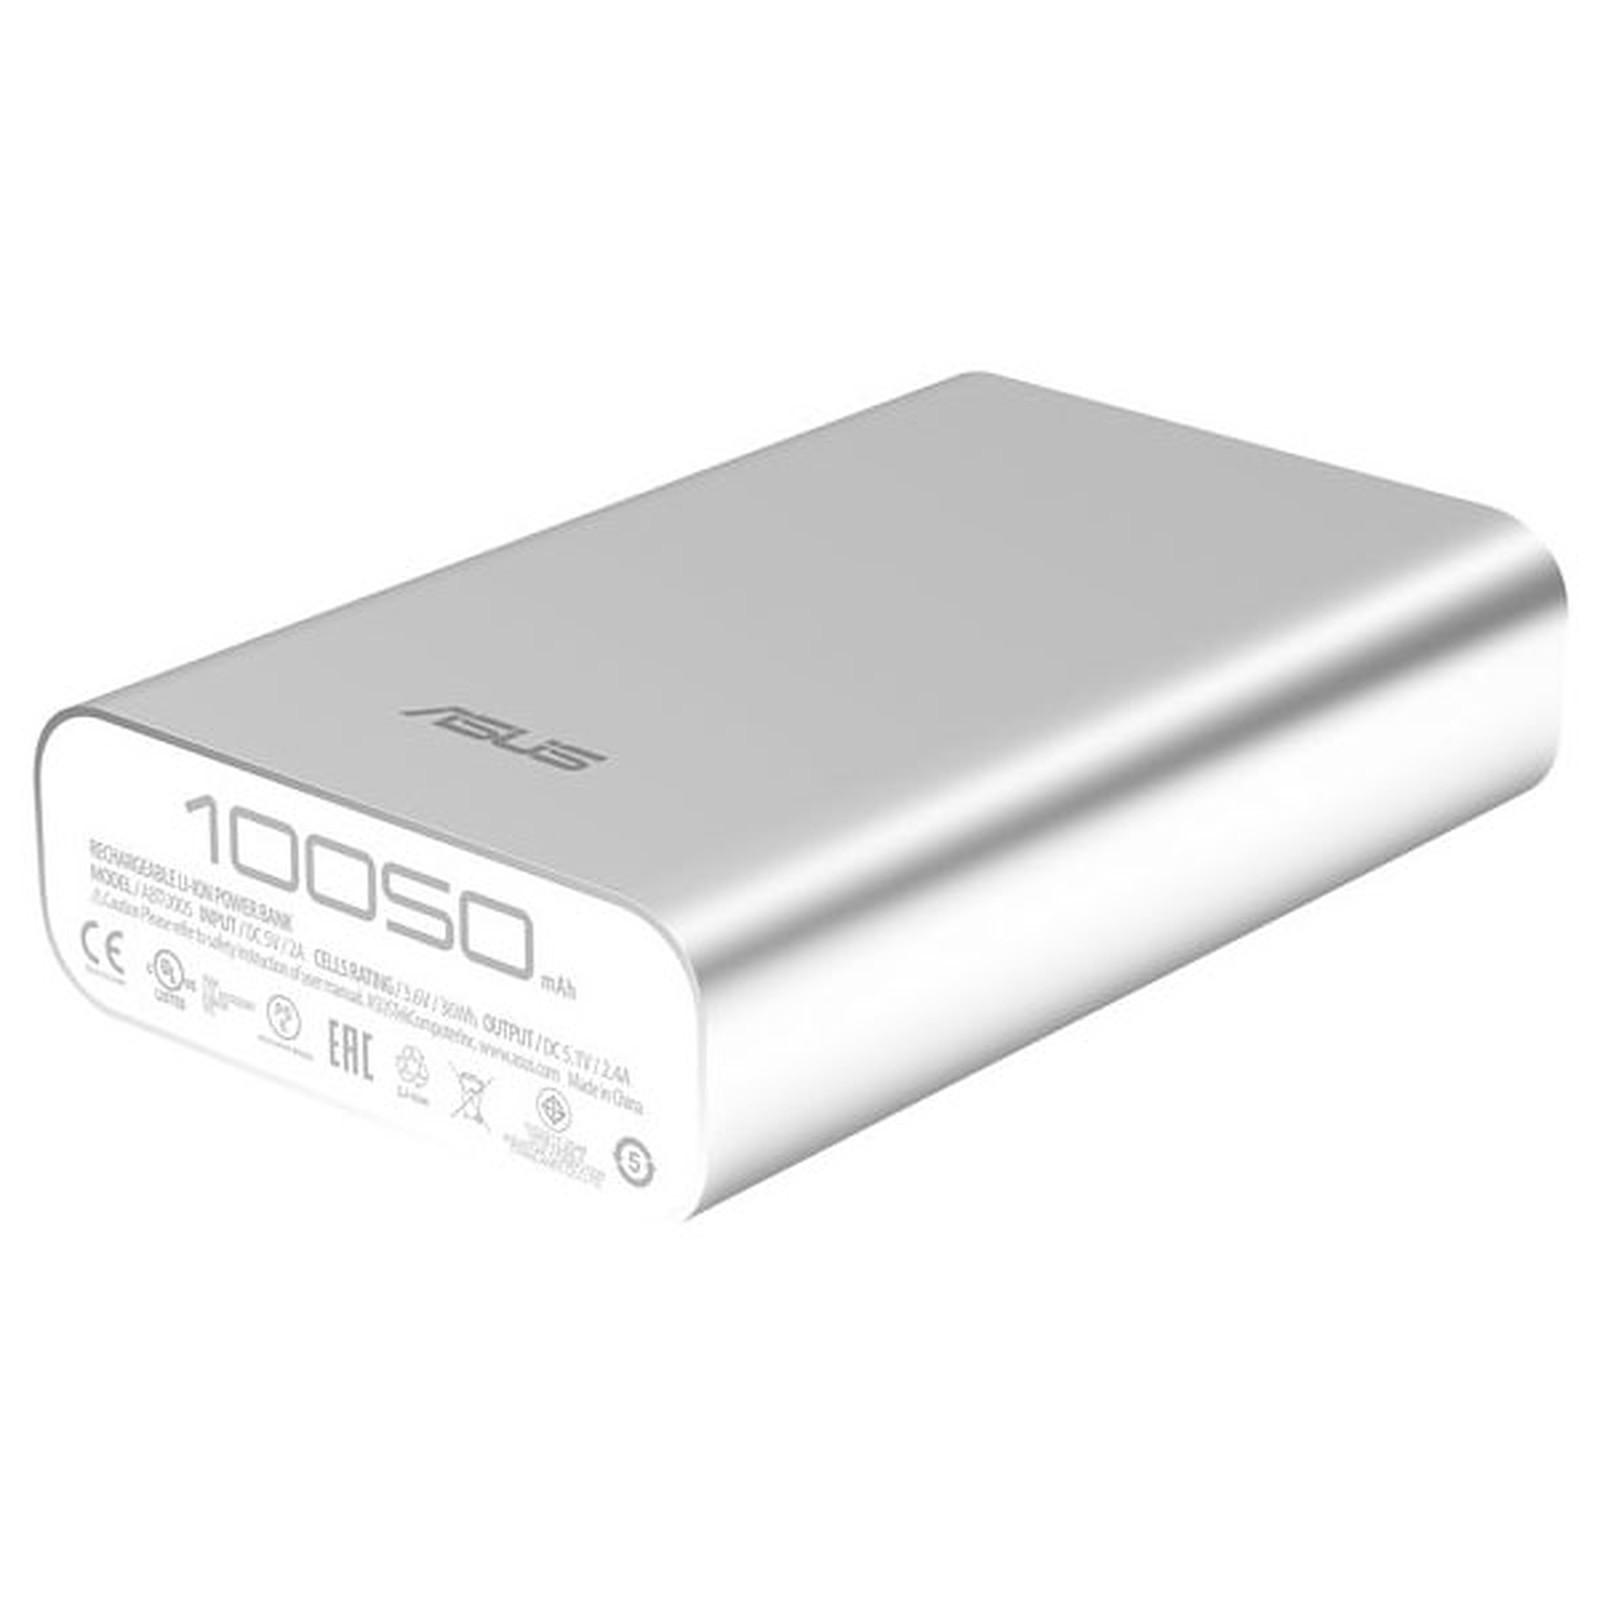 ASUS Zenpower Pro 10050 mAh Quick Charge 2.0 Blanc